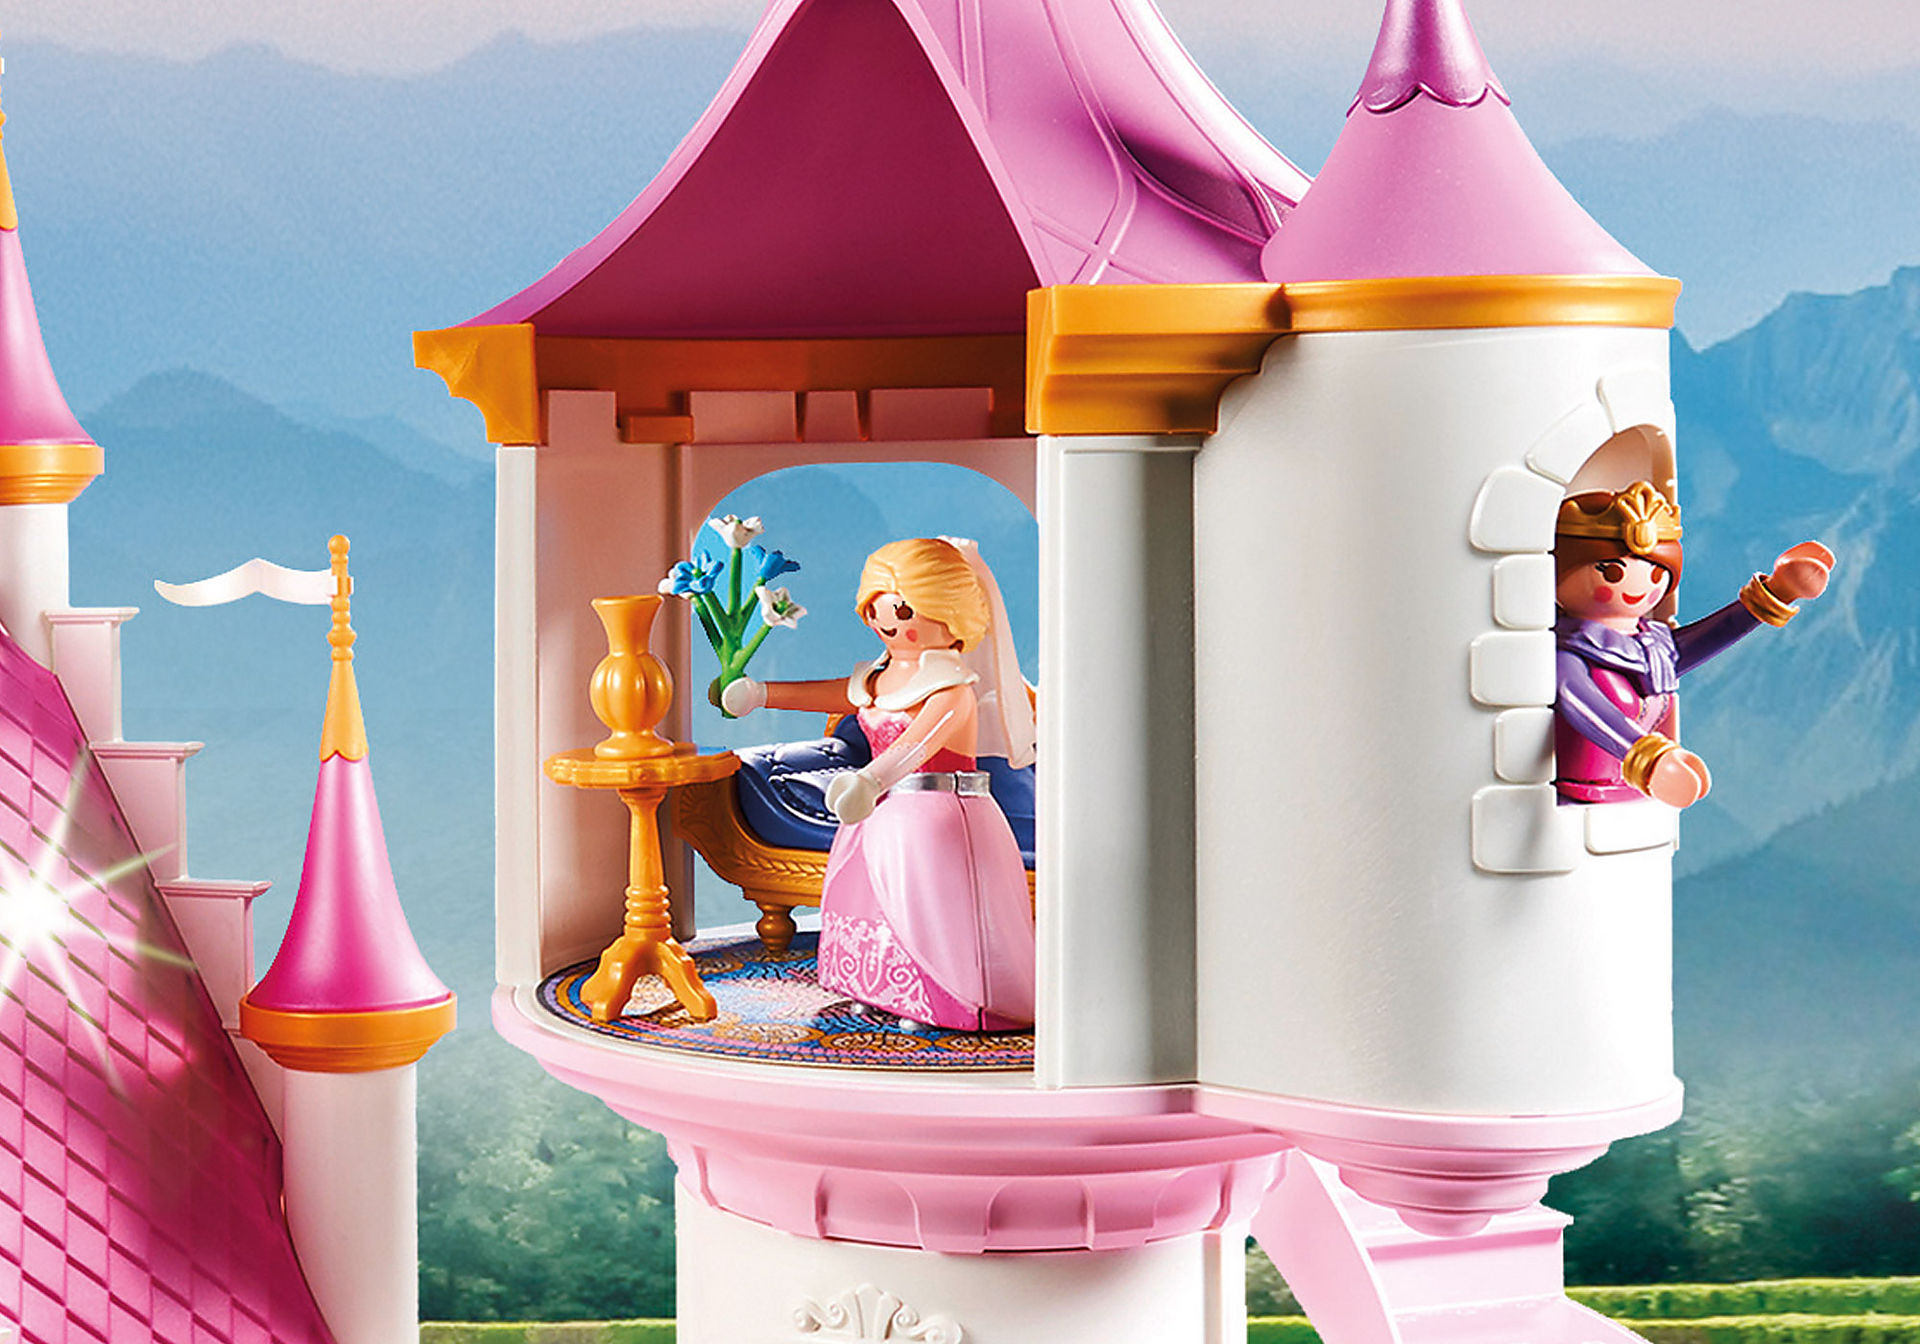 70447 Large Princess Castle zoom image10